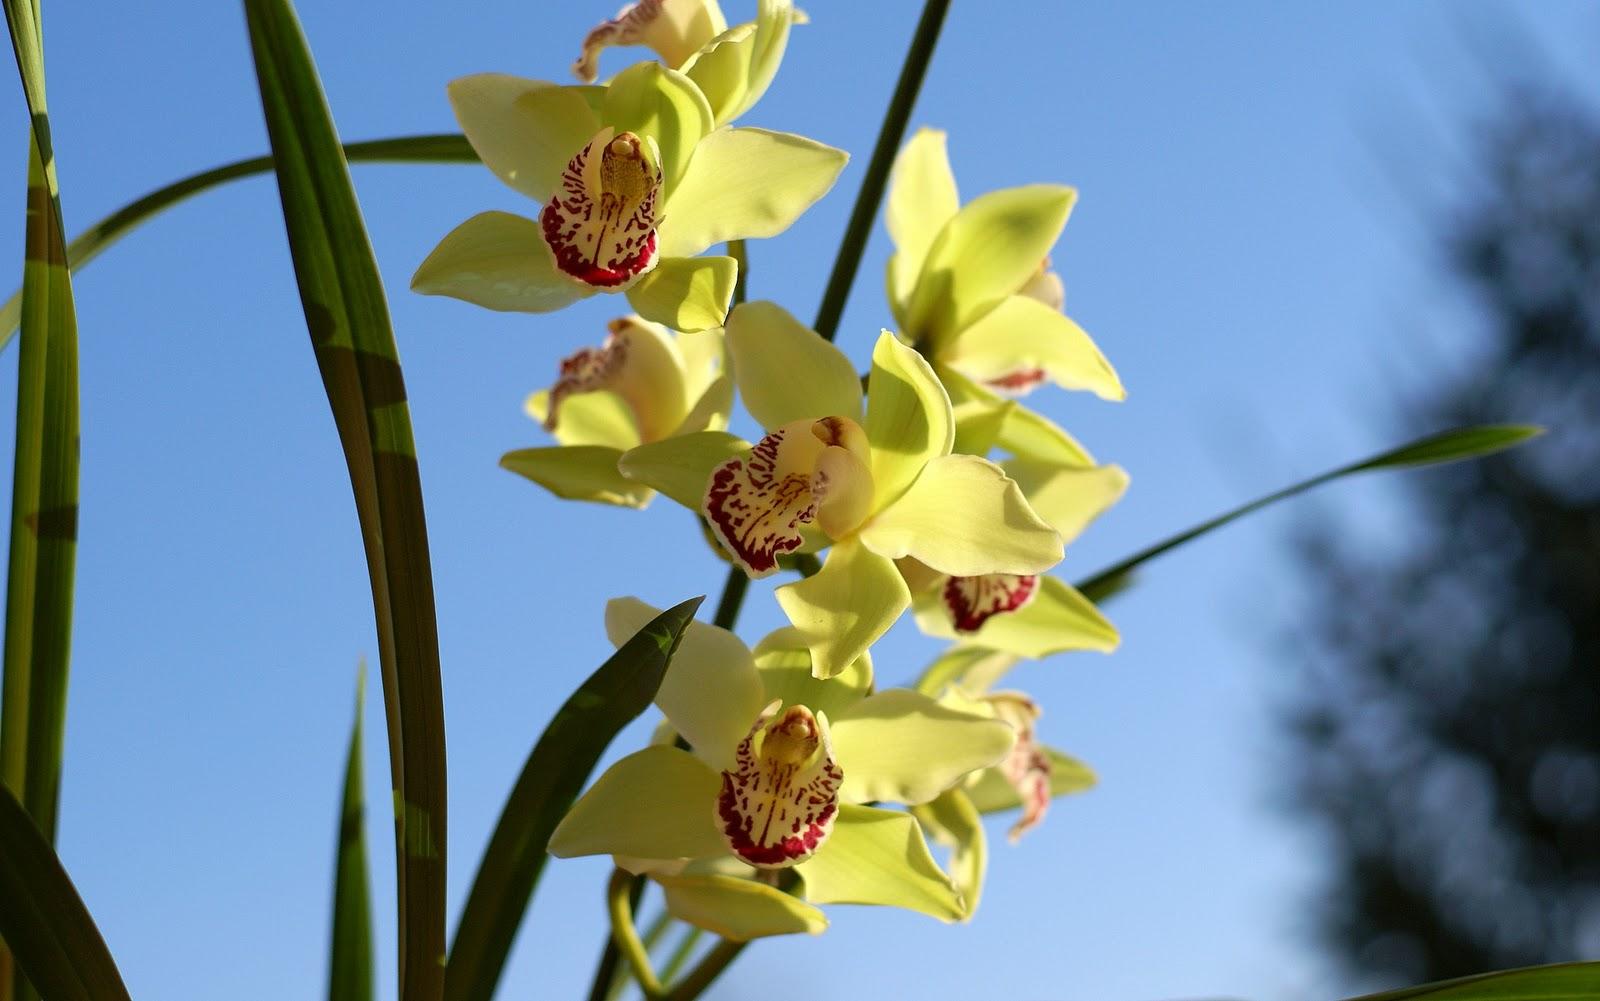 http://4.bp.blogspot.com/_rH30t_UIXBM/TUMWygmTYdI/AAAAAAAAAQ8/jFBI2Ei4SyE/s1600/cymbidium-orchid-sky-background-dsc03655.jpg